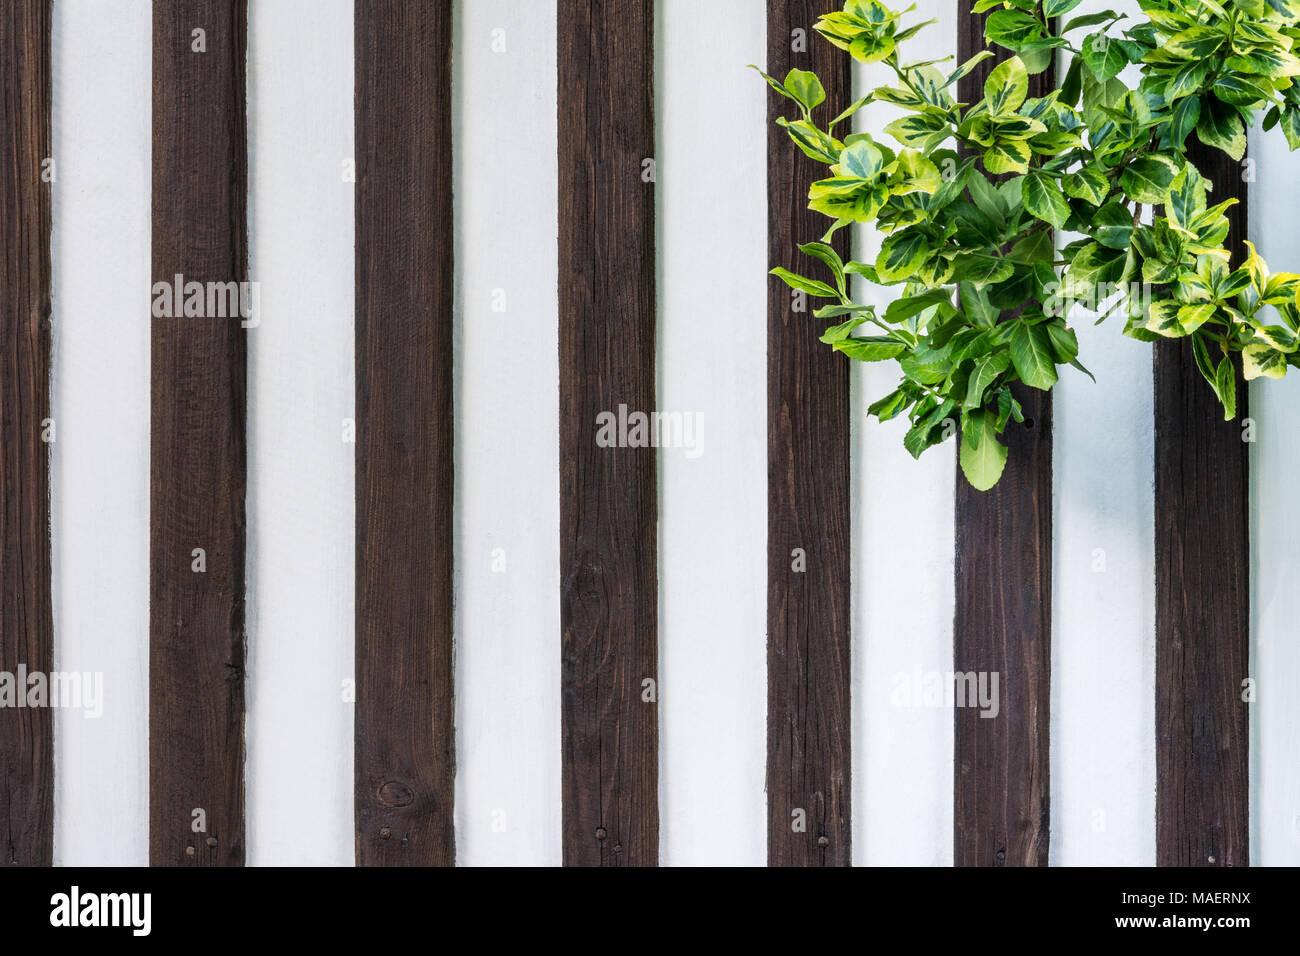 Holz Wand Mit Climbing Ivy Hedera Weissen Zaun Mit Senkrechten